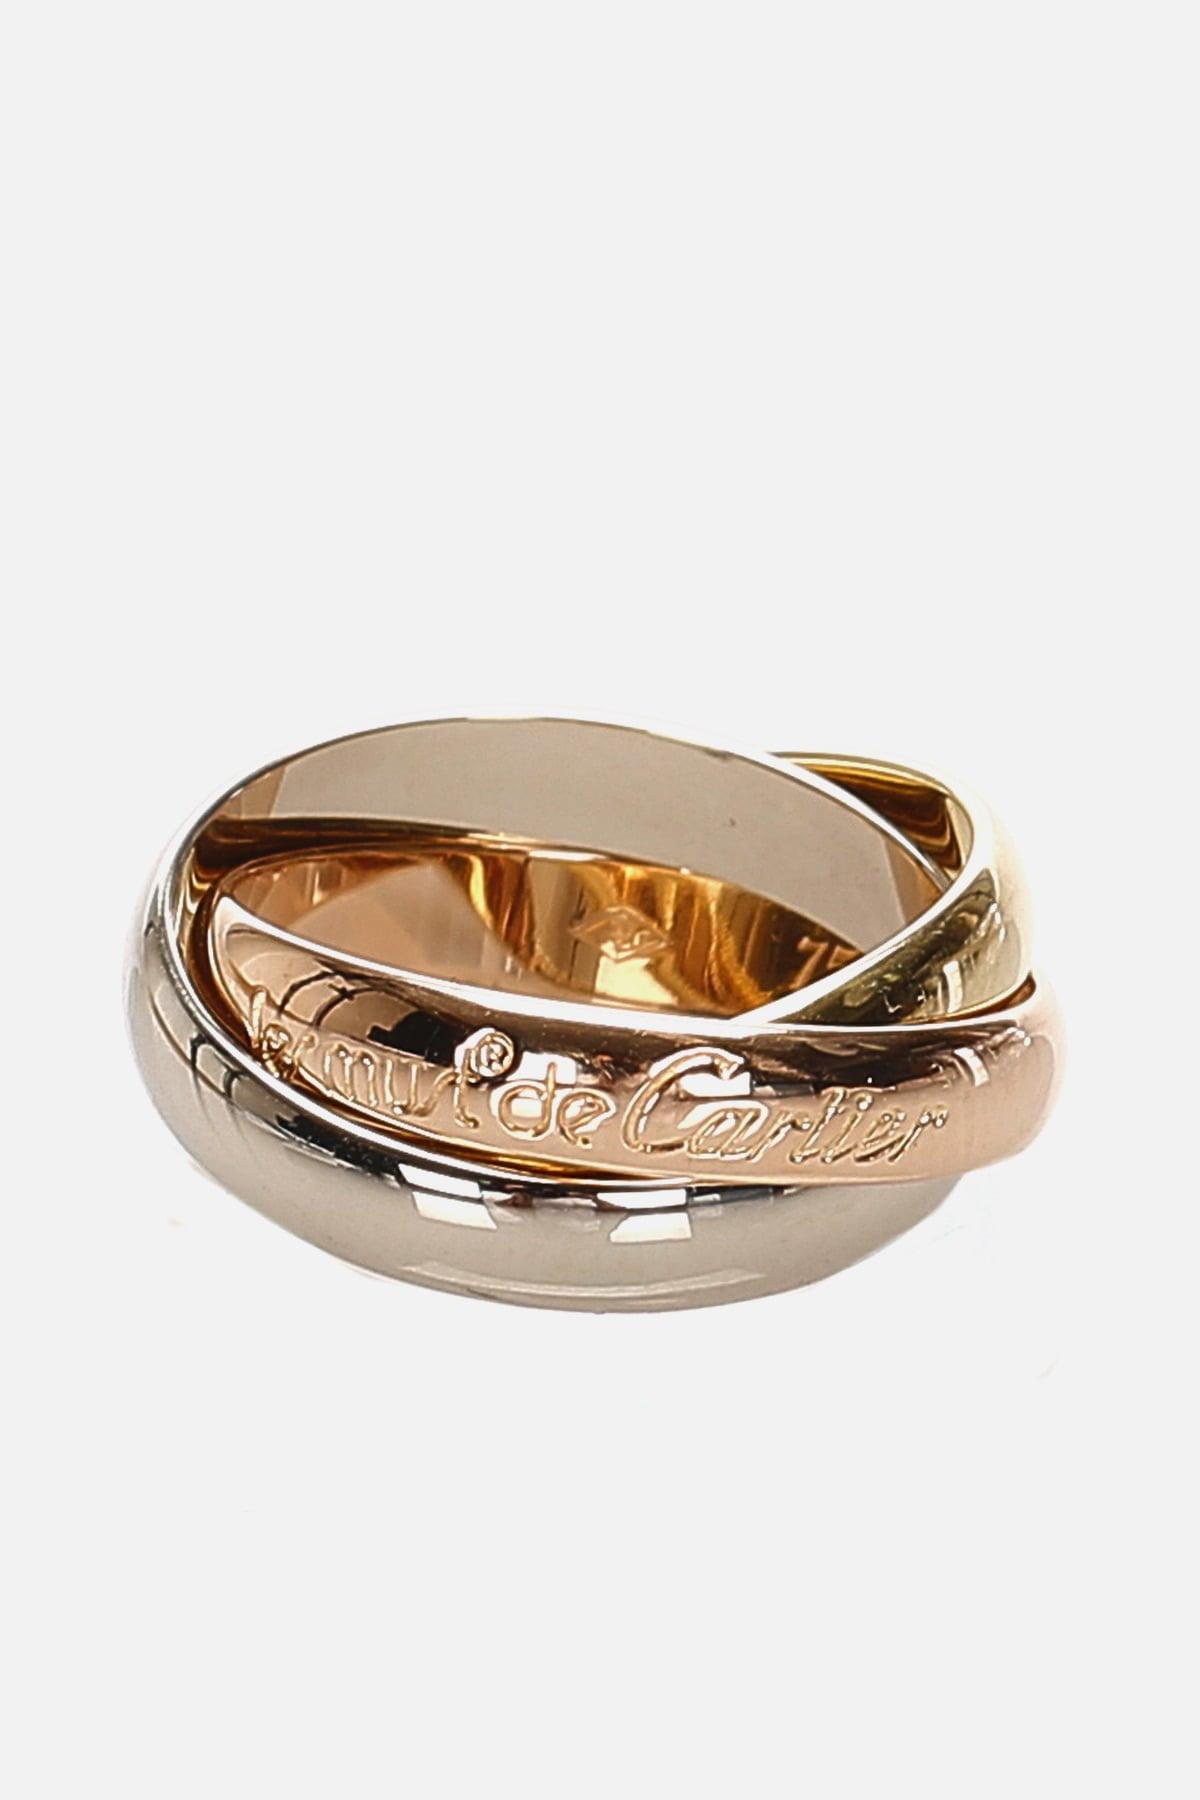 Les Must de Cartier Trinity Ring